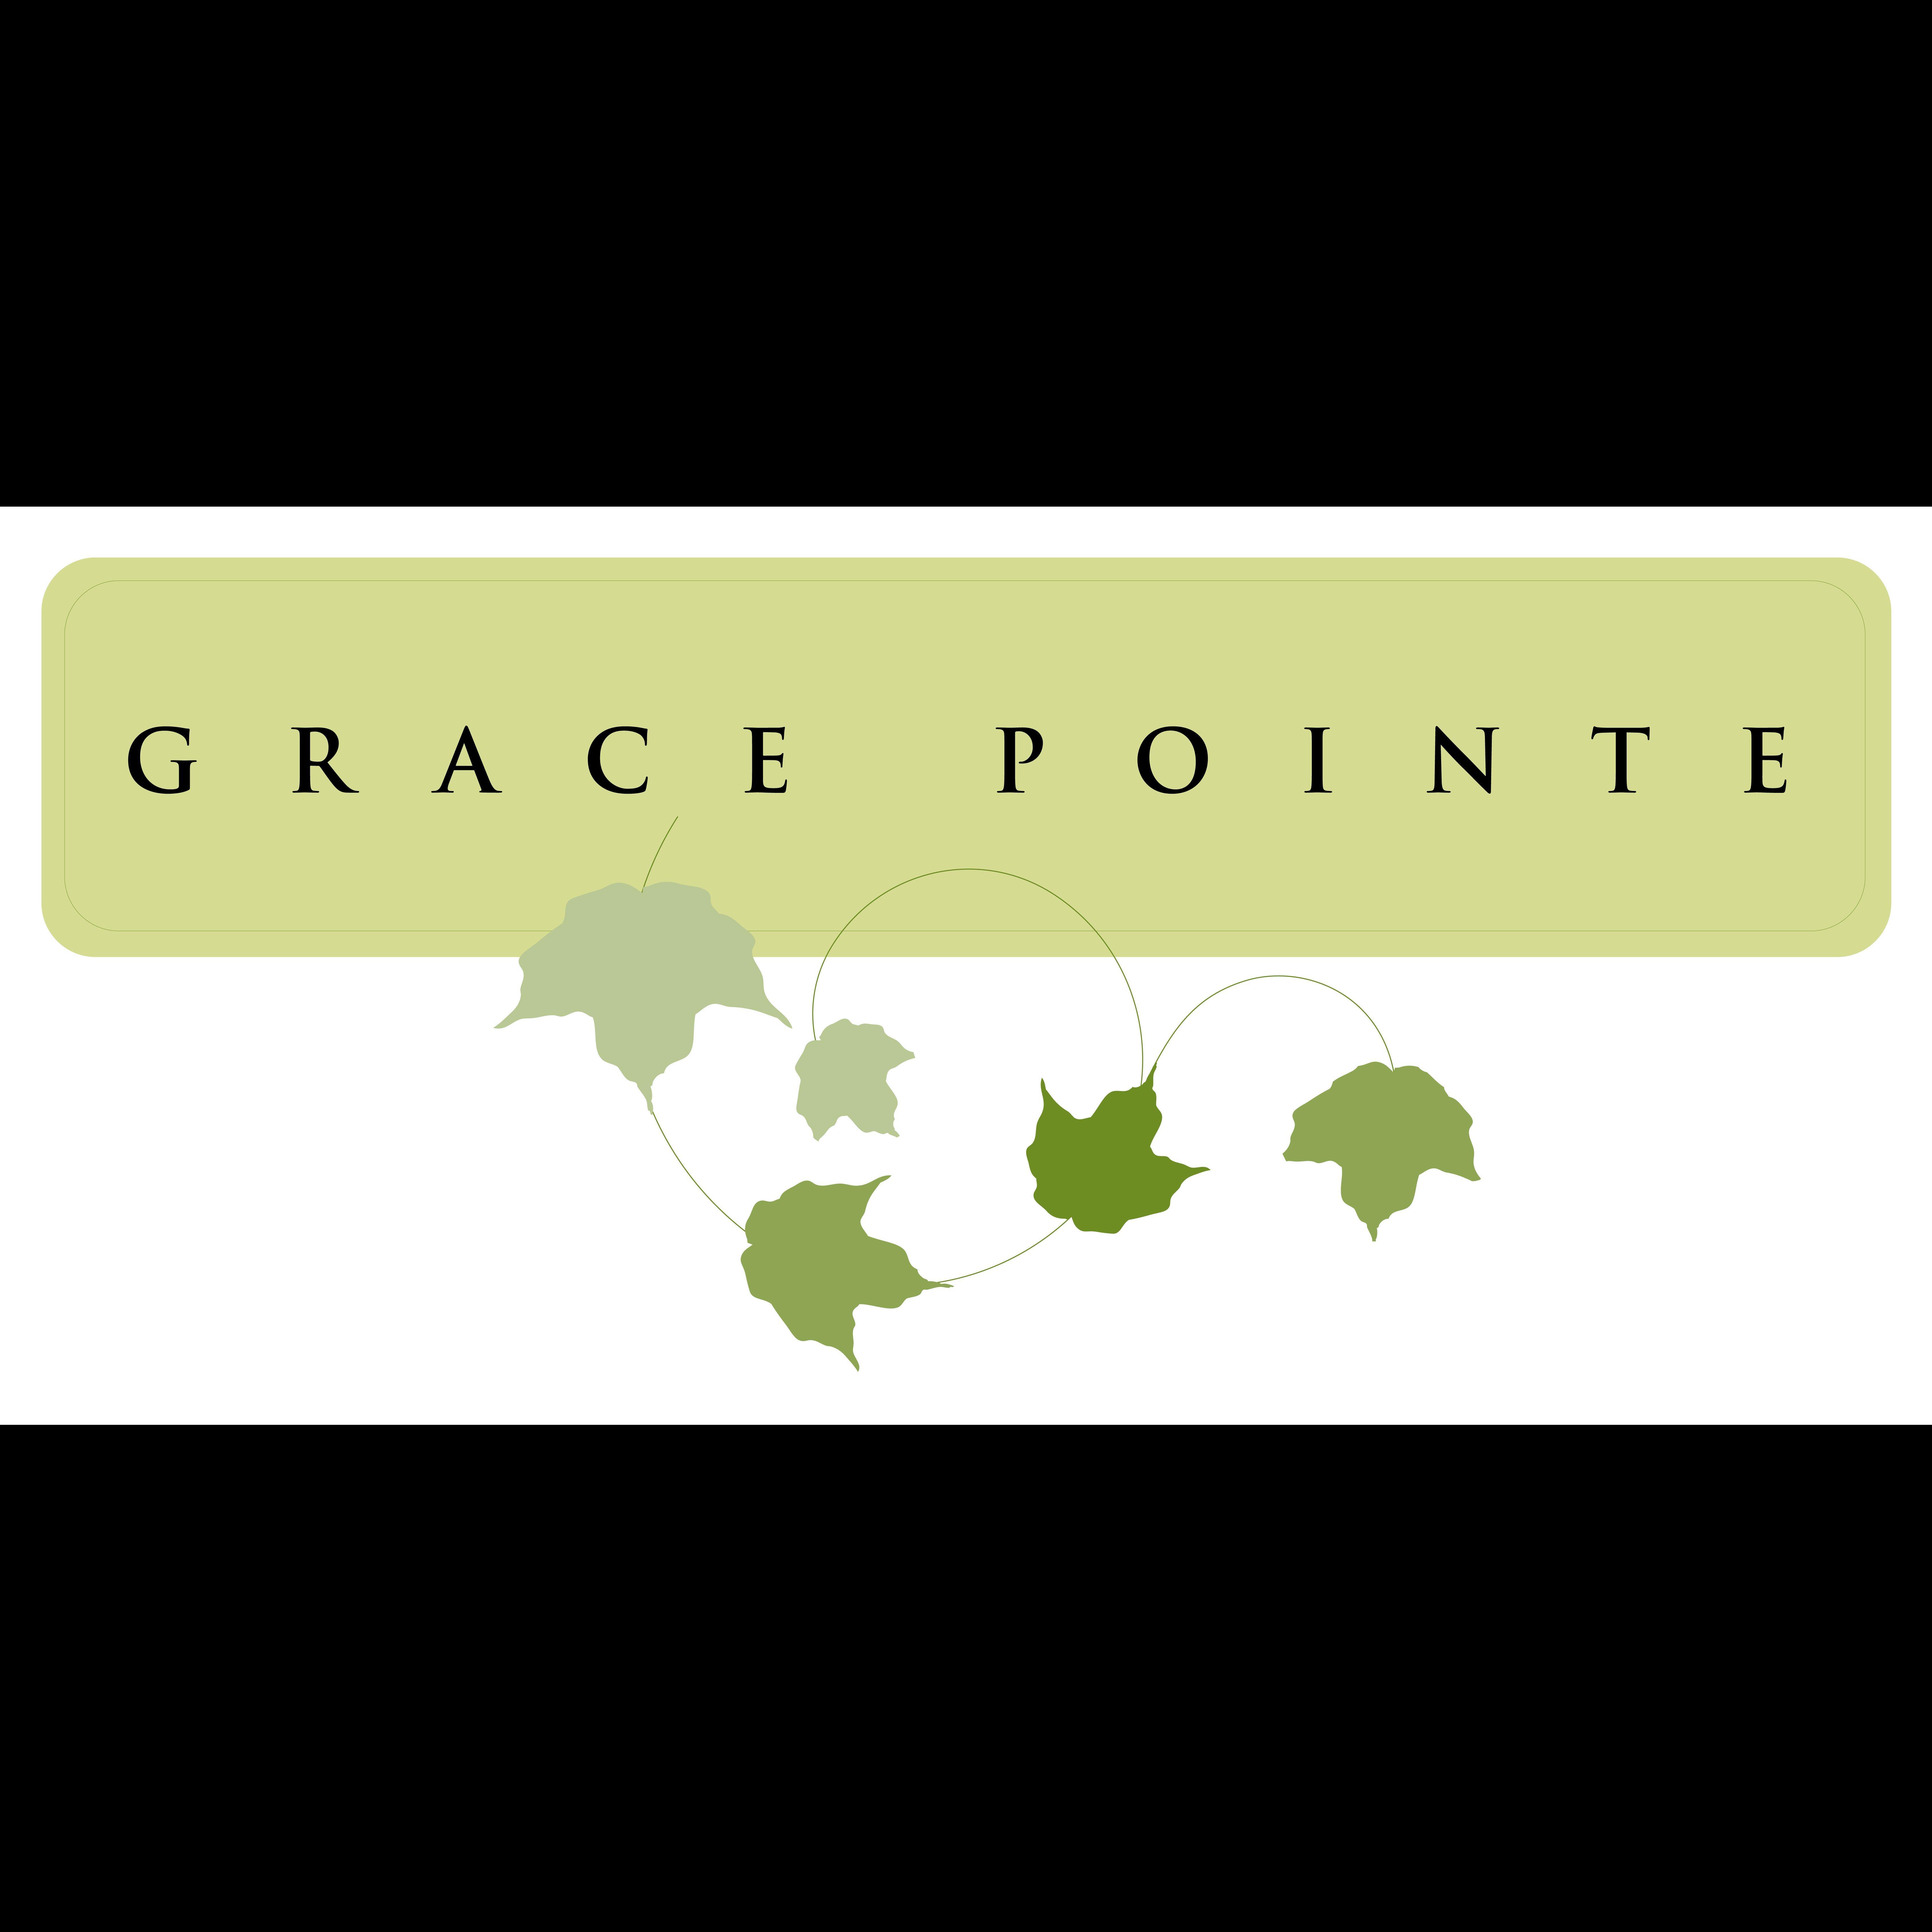 Grace Pointe Continuing Care Senior Campus, Skilled Nursing